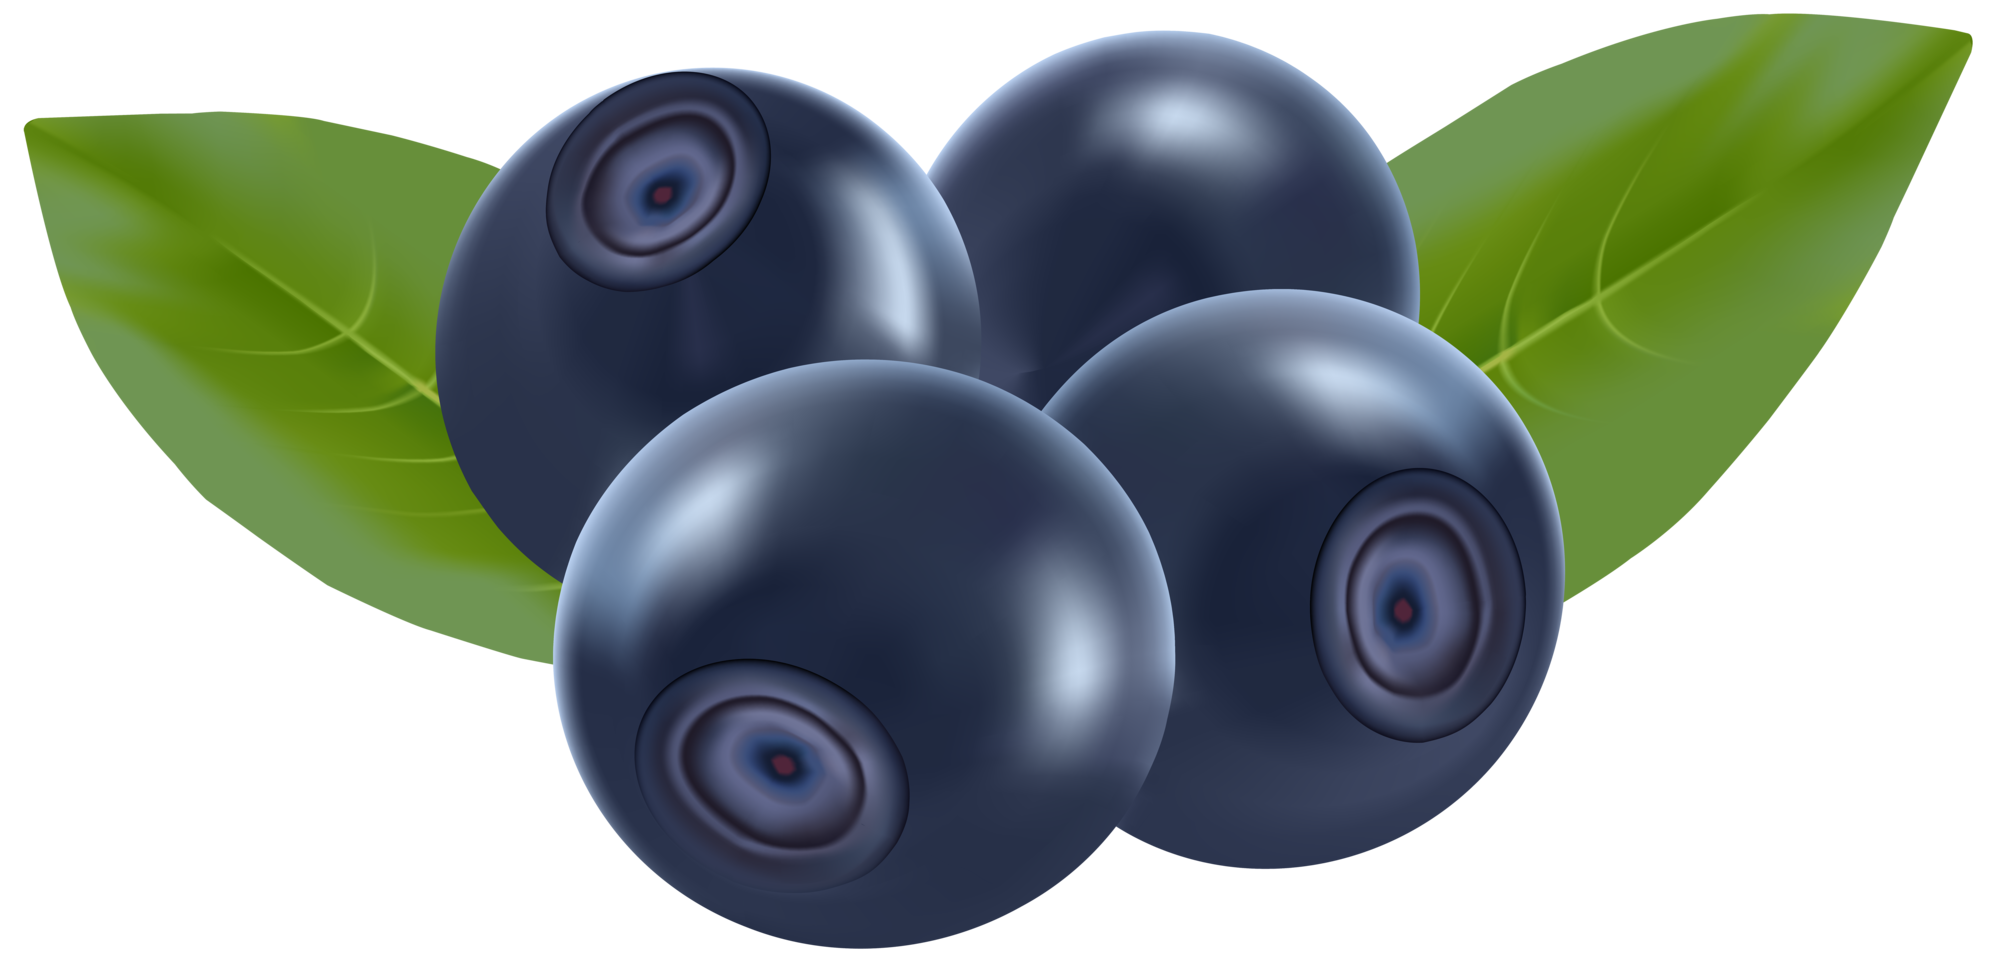 2000x968 Blueberries Png Clip Art